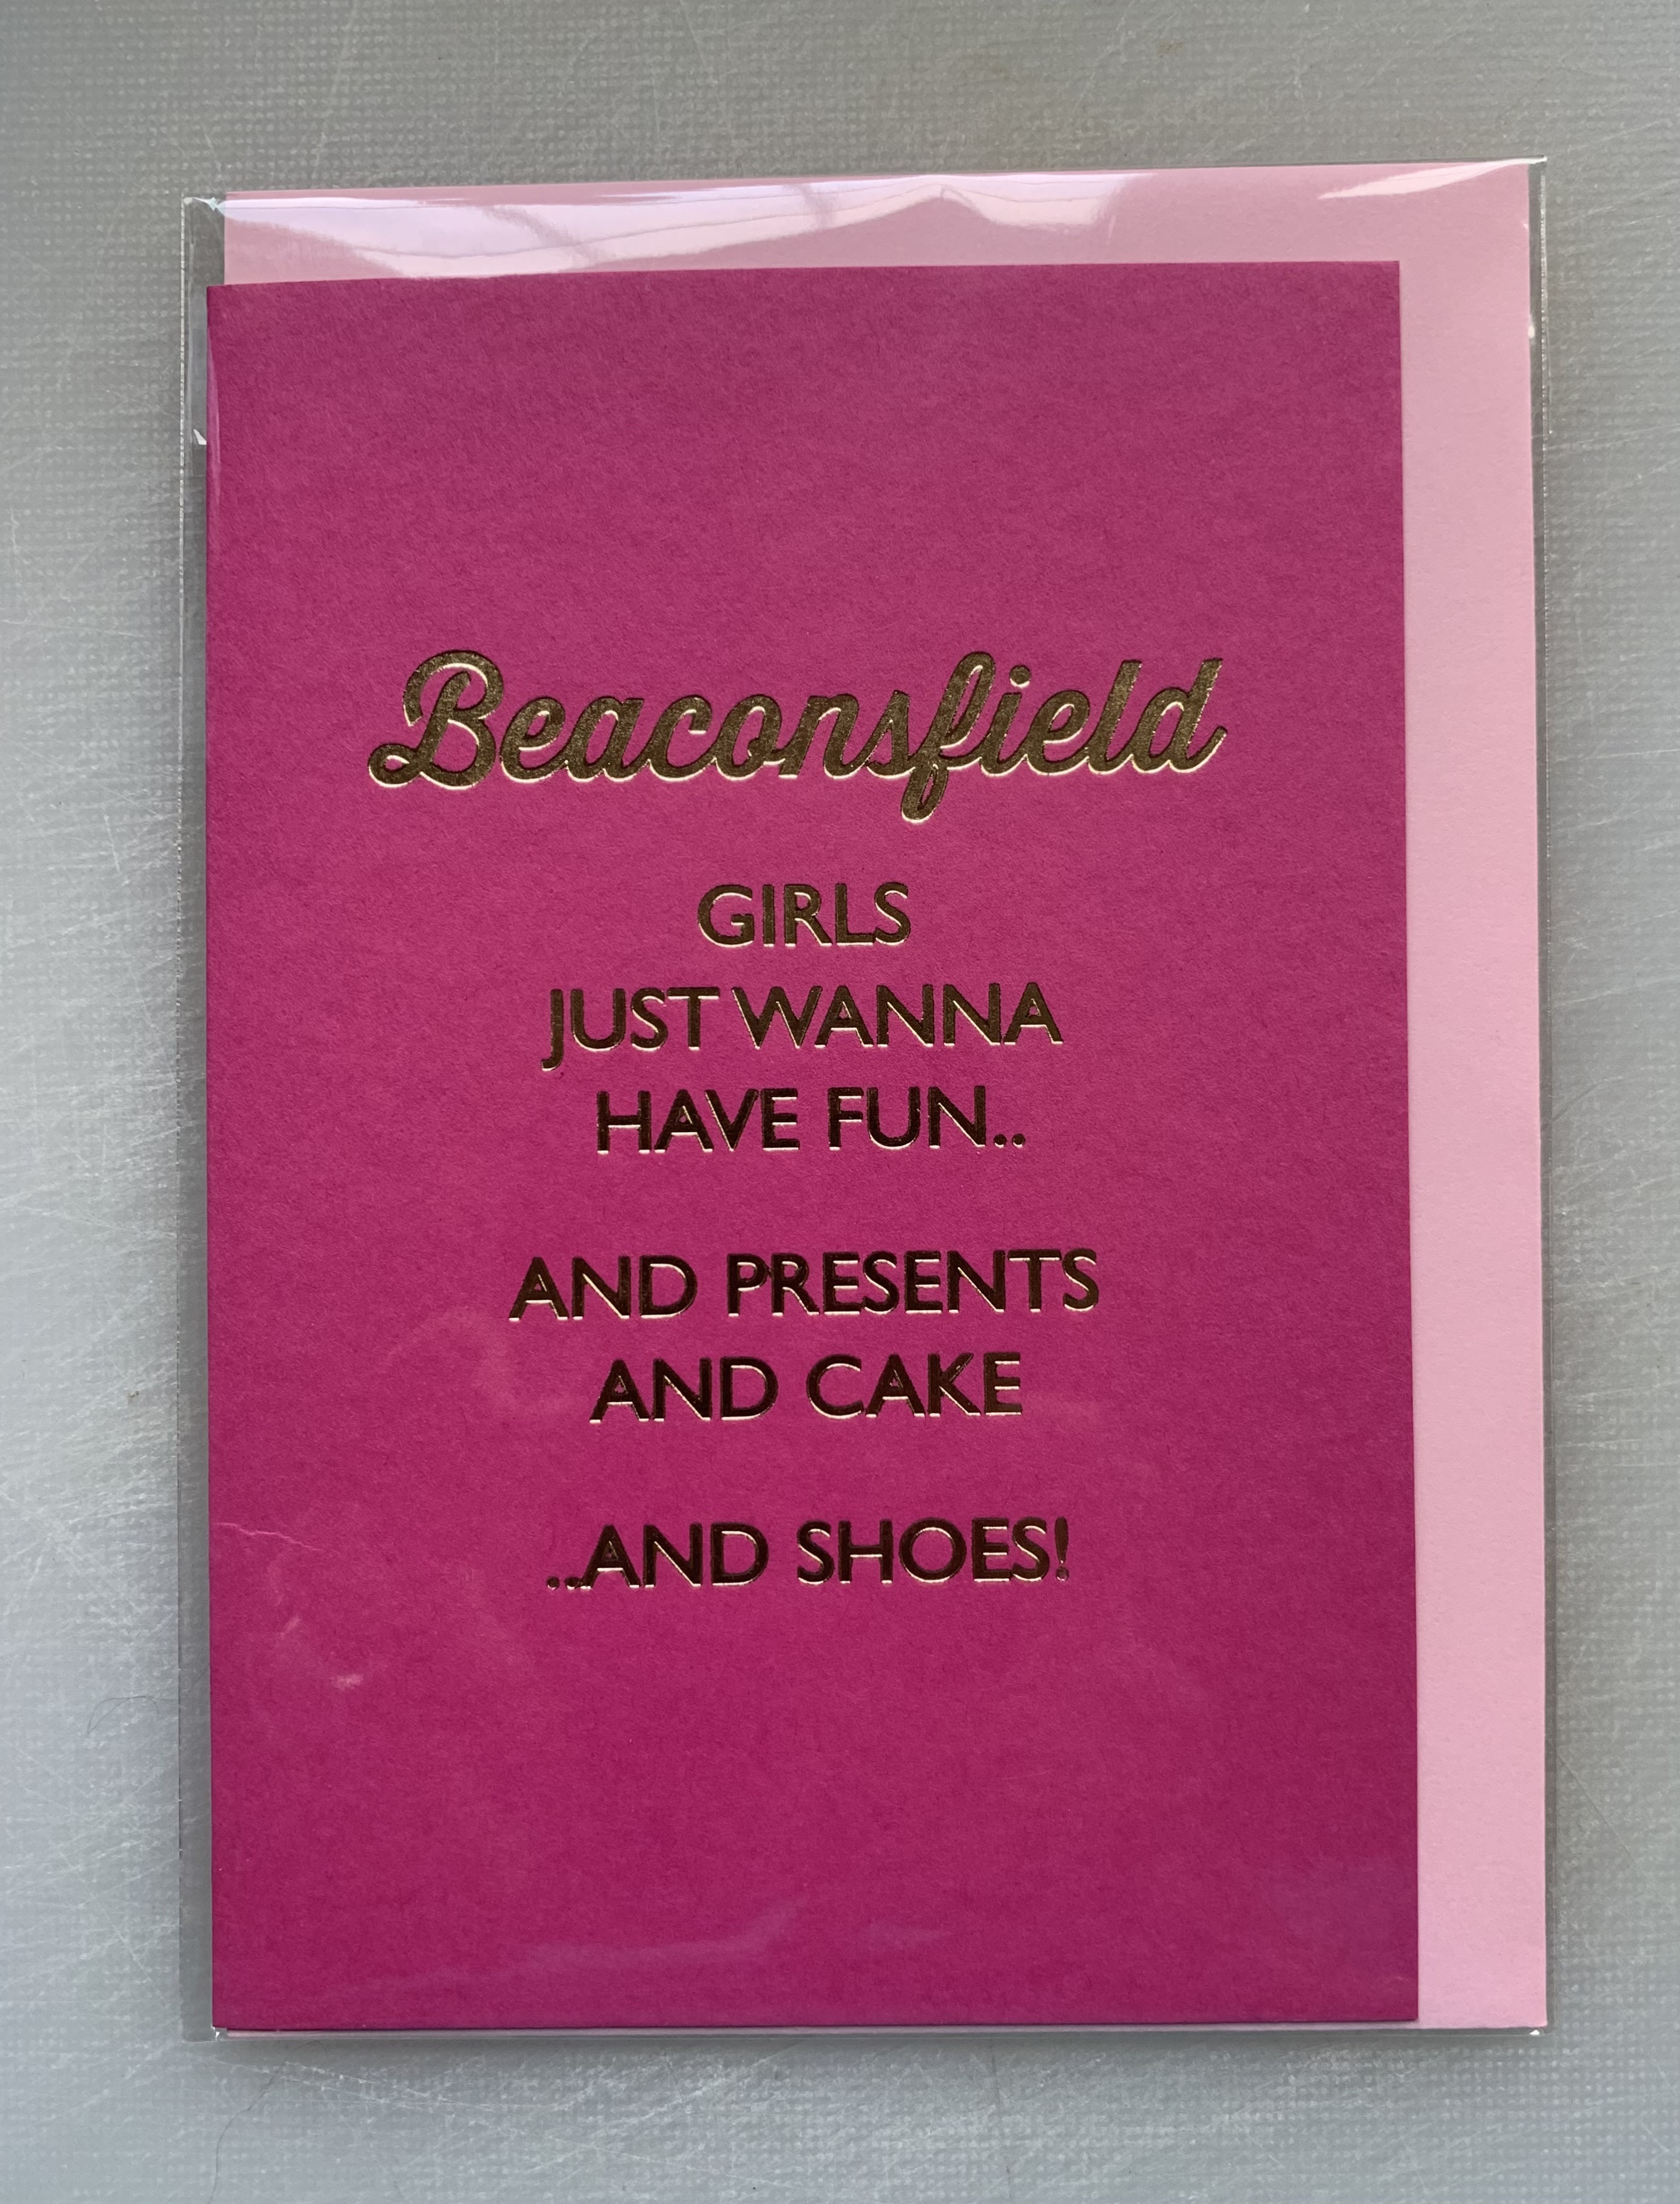 Card Female Bluebell - Girls Wanna Have Fun BF D237